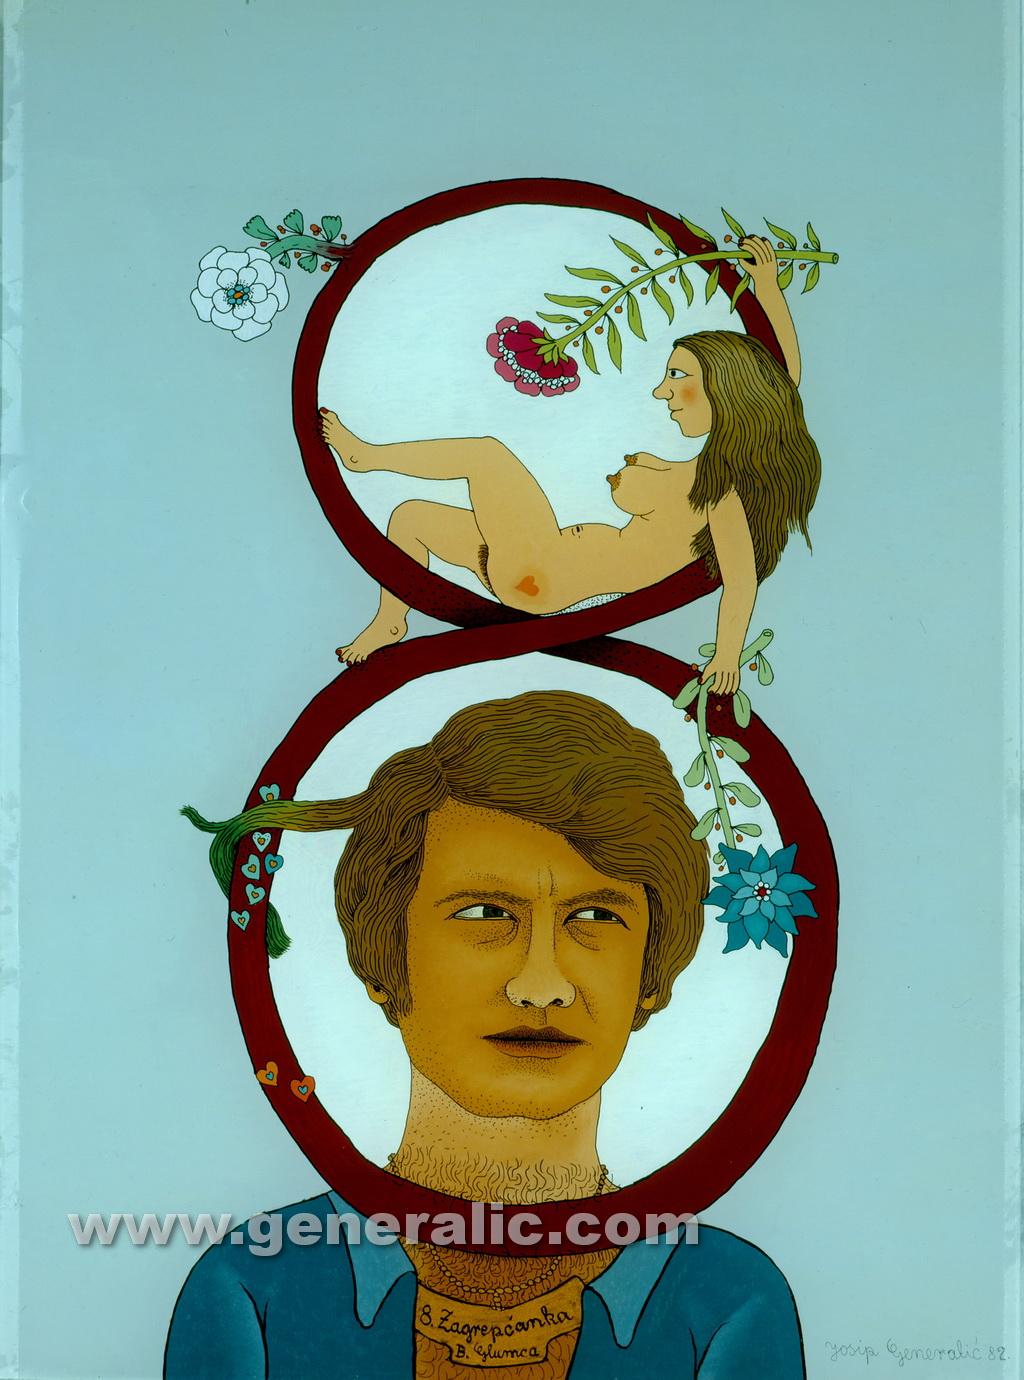 Josip Generalic, 1982, Eighth woman from Zagreb, oil on glass